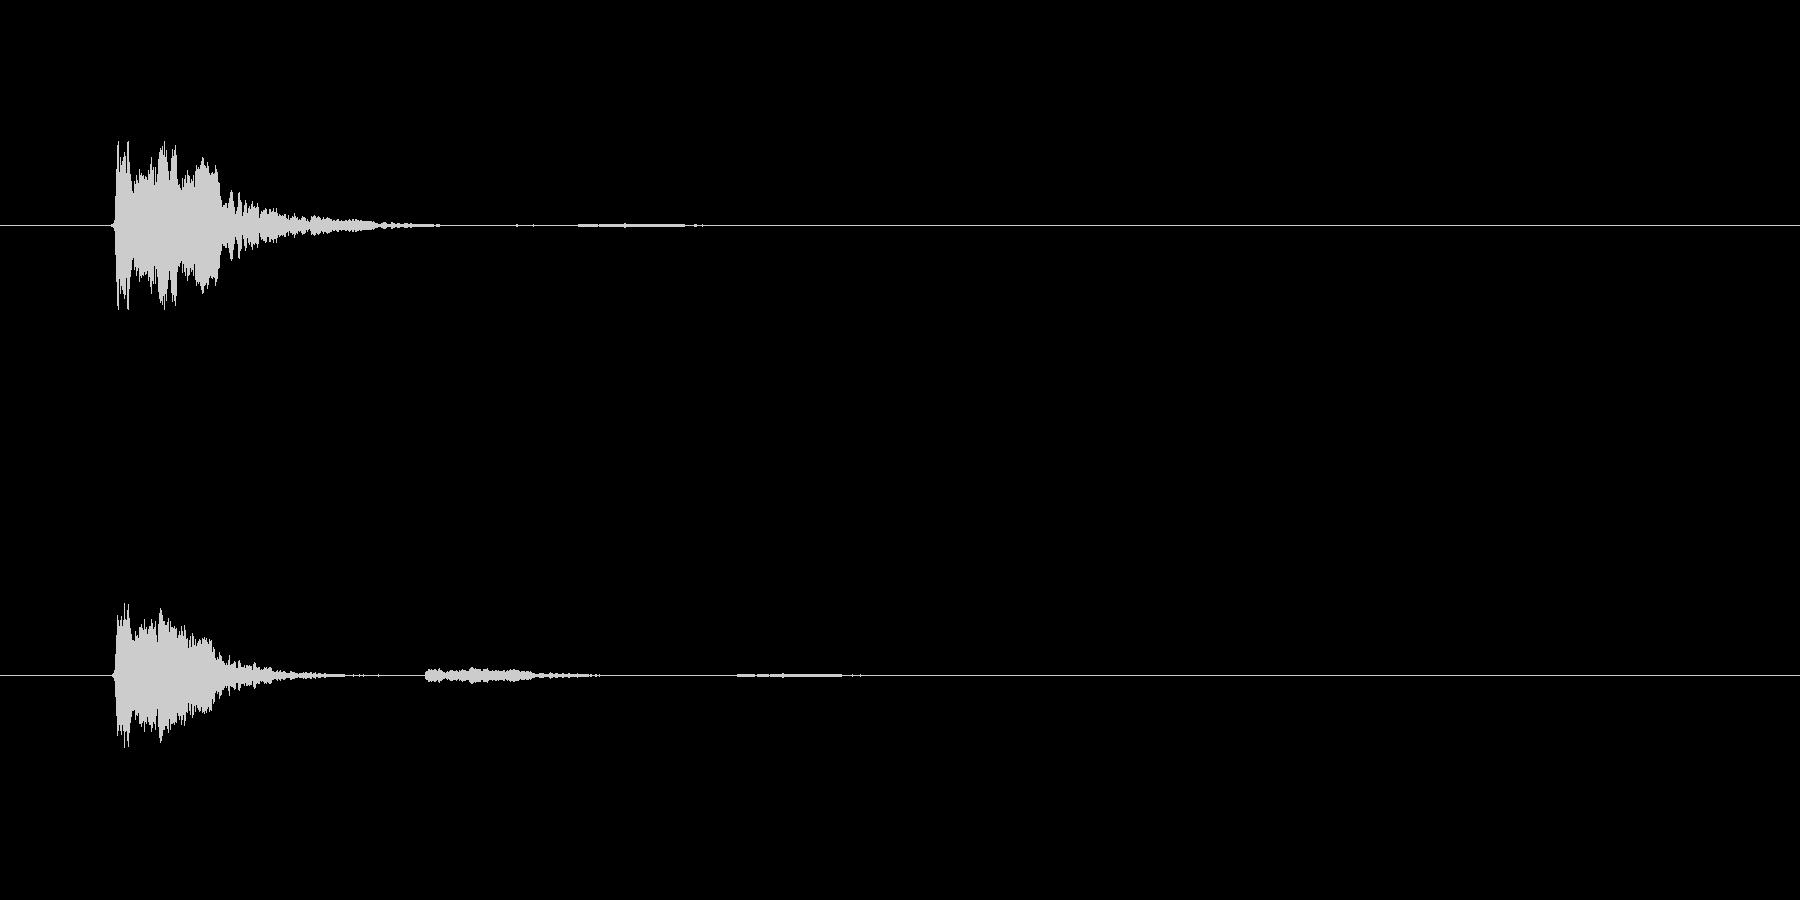 【SE 効果音】SF的な音15の未再生の波形